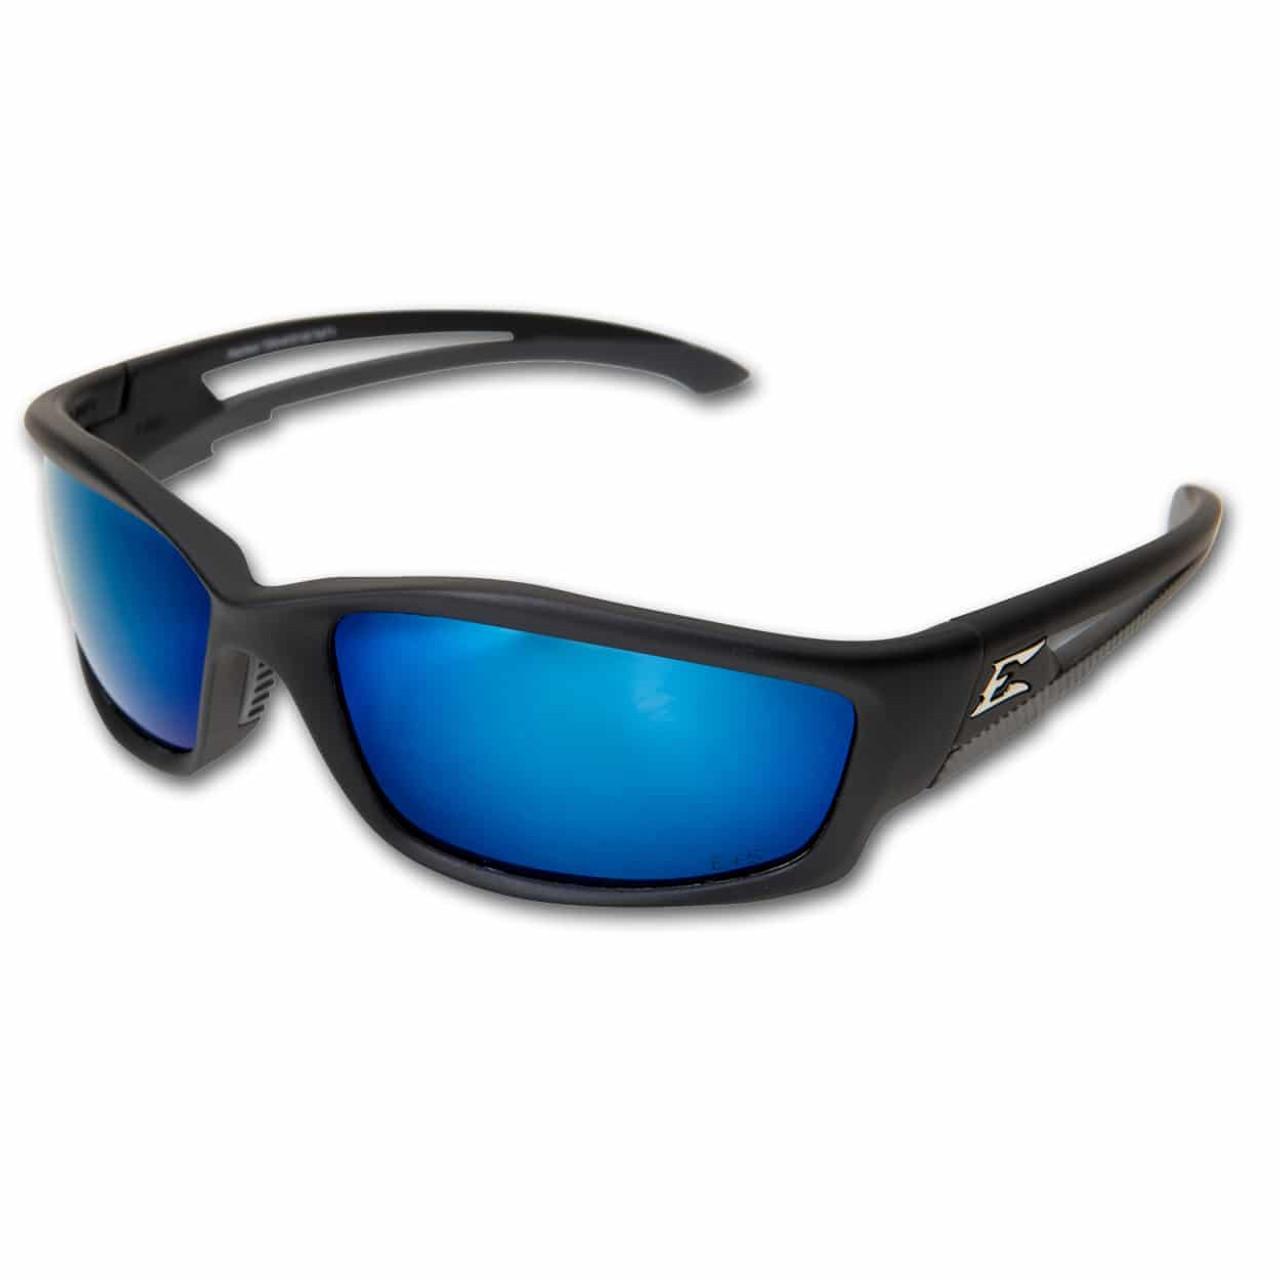 Edge Kazbek - Polarized Aqua Precision Blue Safety Glasses